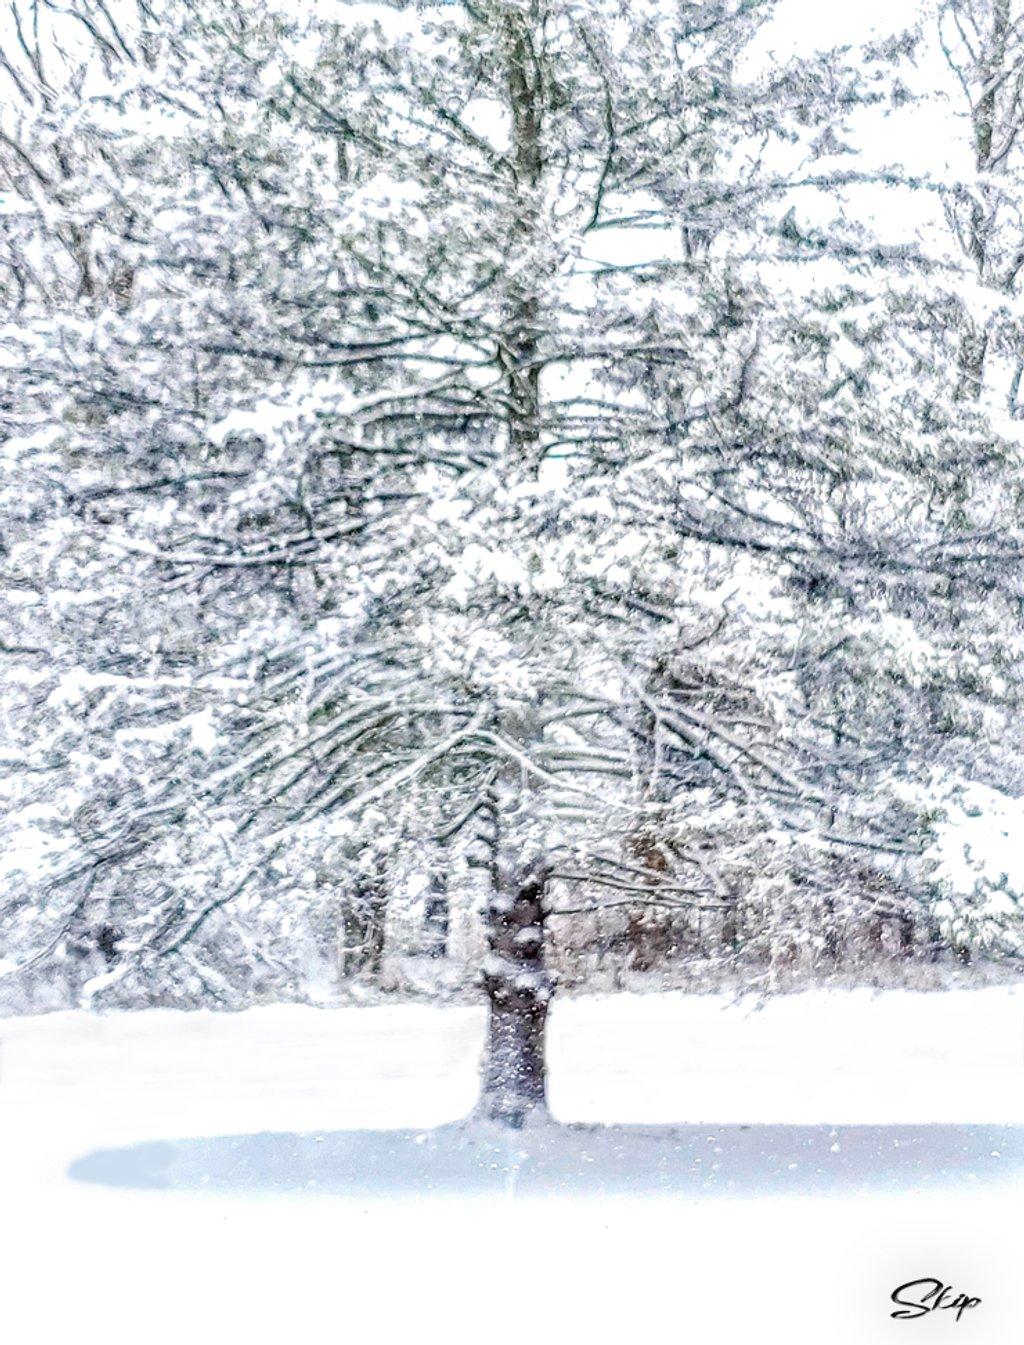 Let It Snow, Let It Snow, Let It Snow  by skipt07